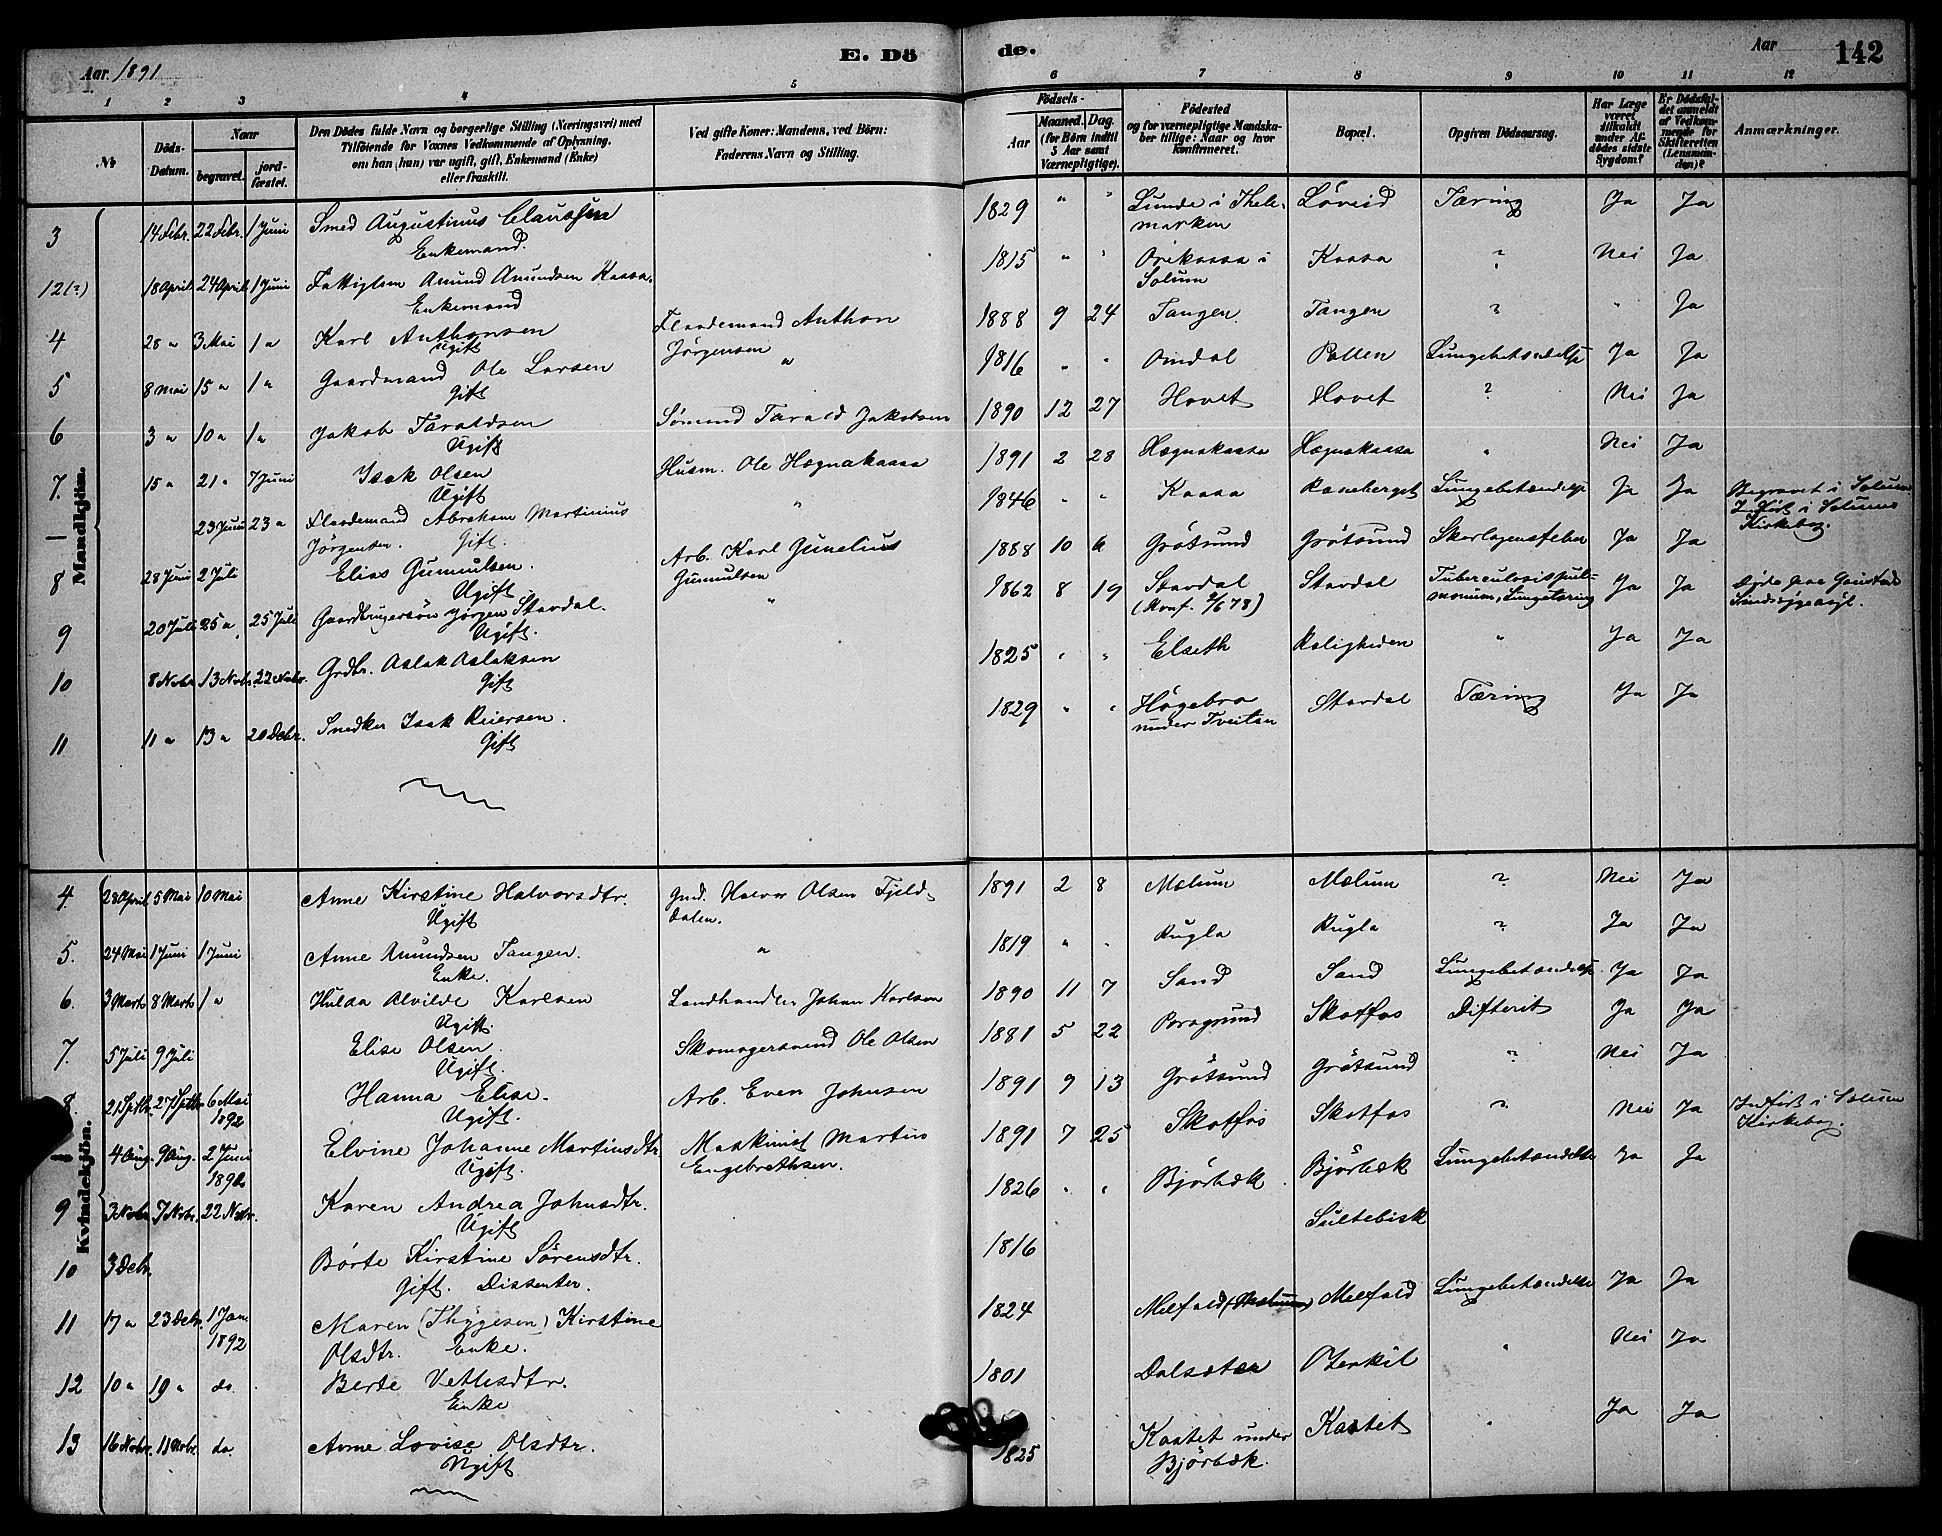 SAKO, Solum kirkebøker, G/Gb/L0003: Klokkerbok nr. II 3, 1880-1898, s. 142